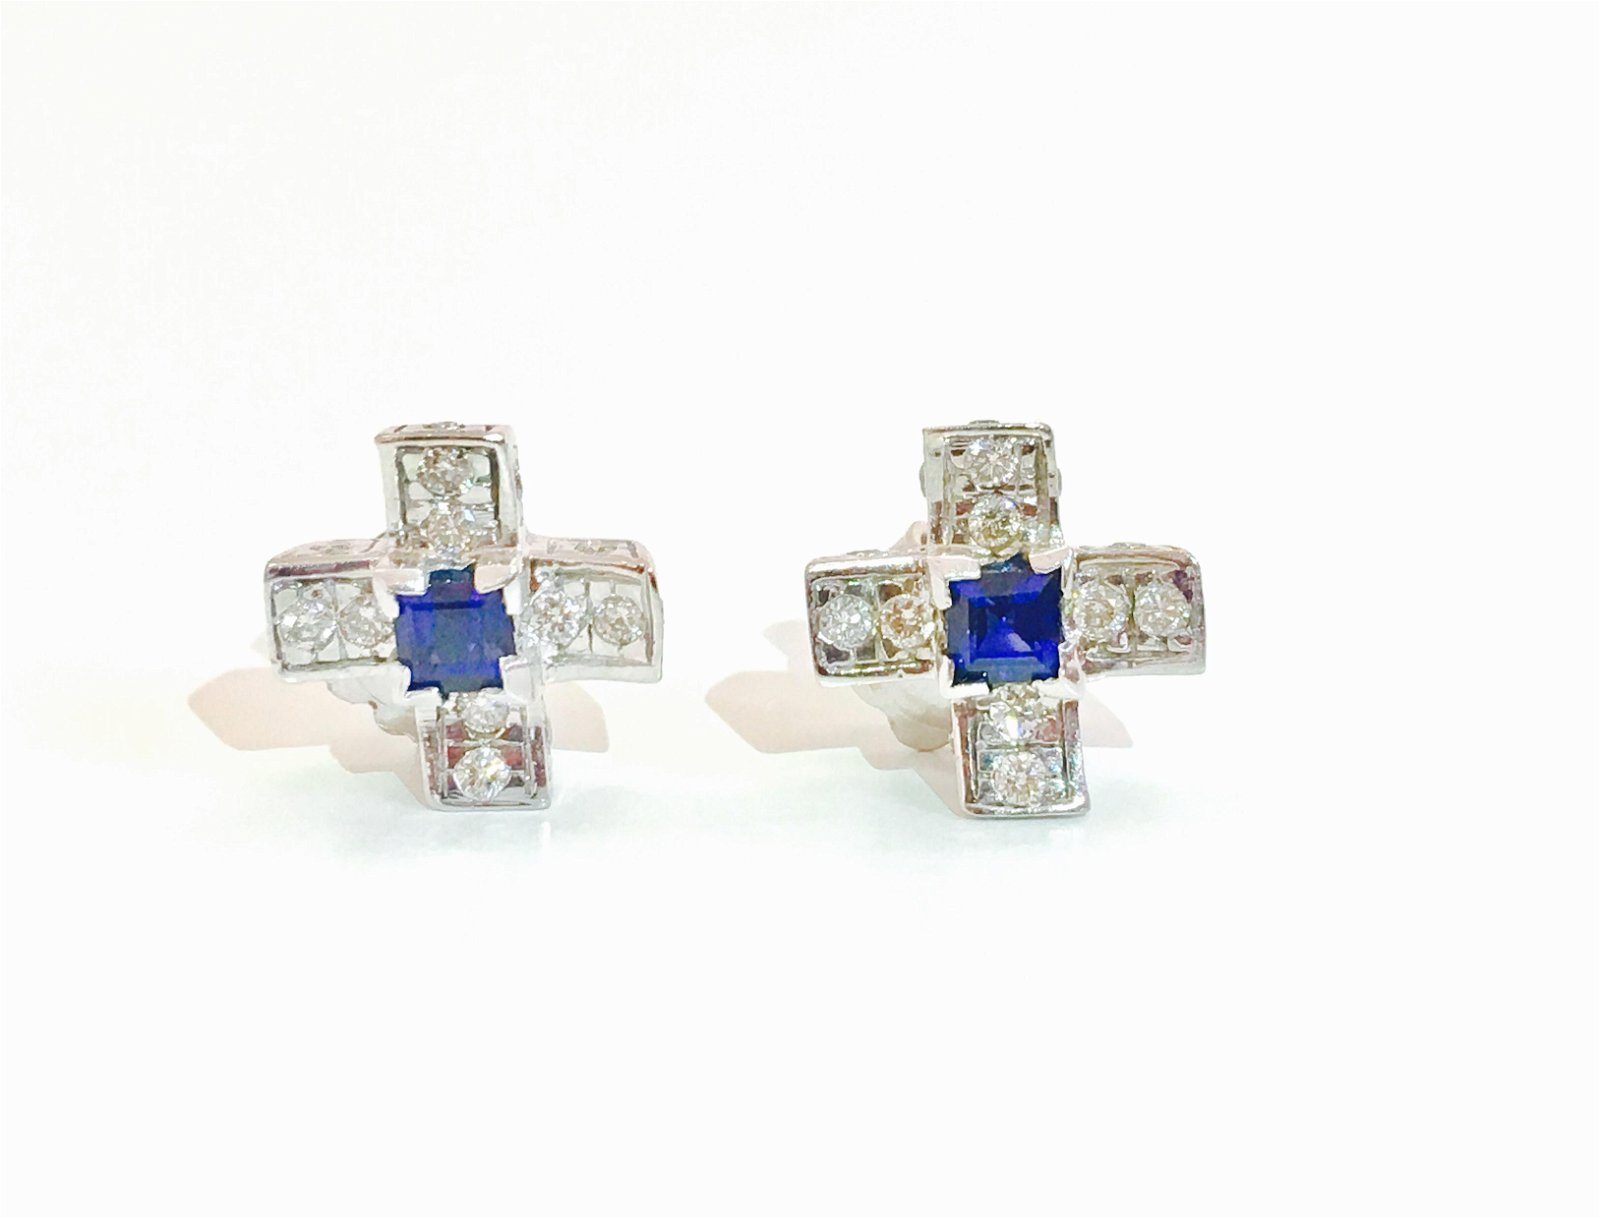 14K Gold. 1.00 CT diamond & Blue Sapphire Stud Earrings